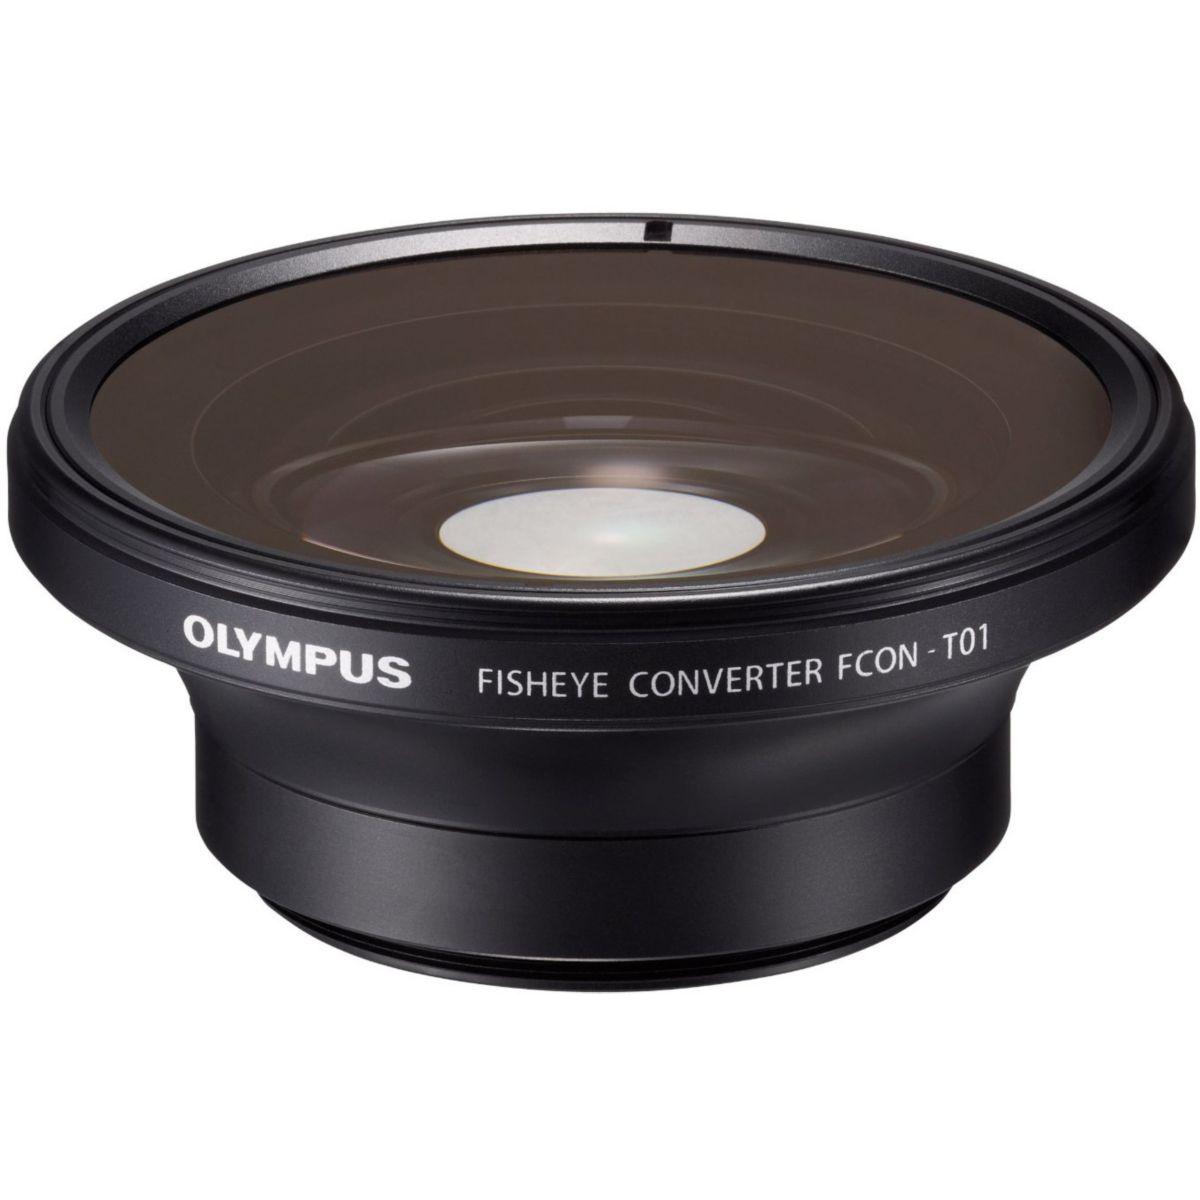 Objectif olympus convertisseur fisheye fcon-p01 pour tg-1, 2, 3, 4